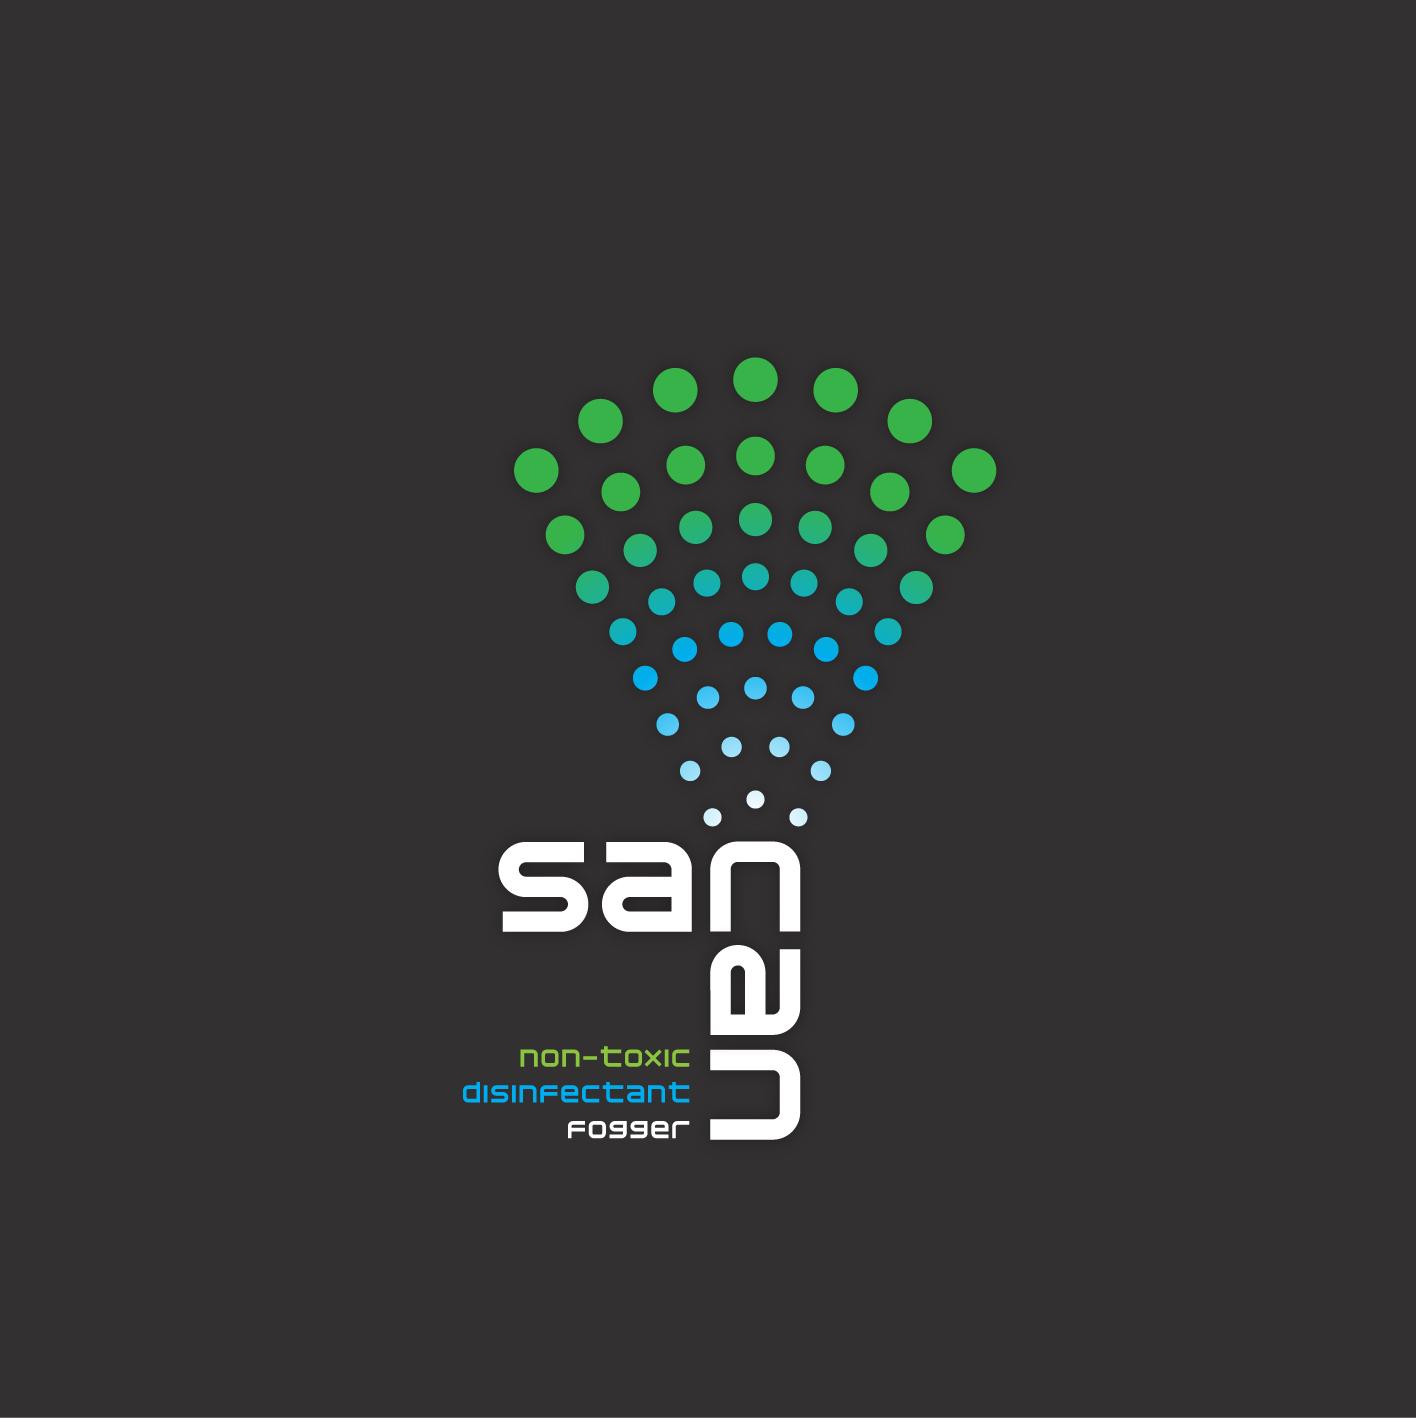 SanCan Non-Toxic Disinfectant Fogger